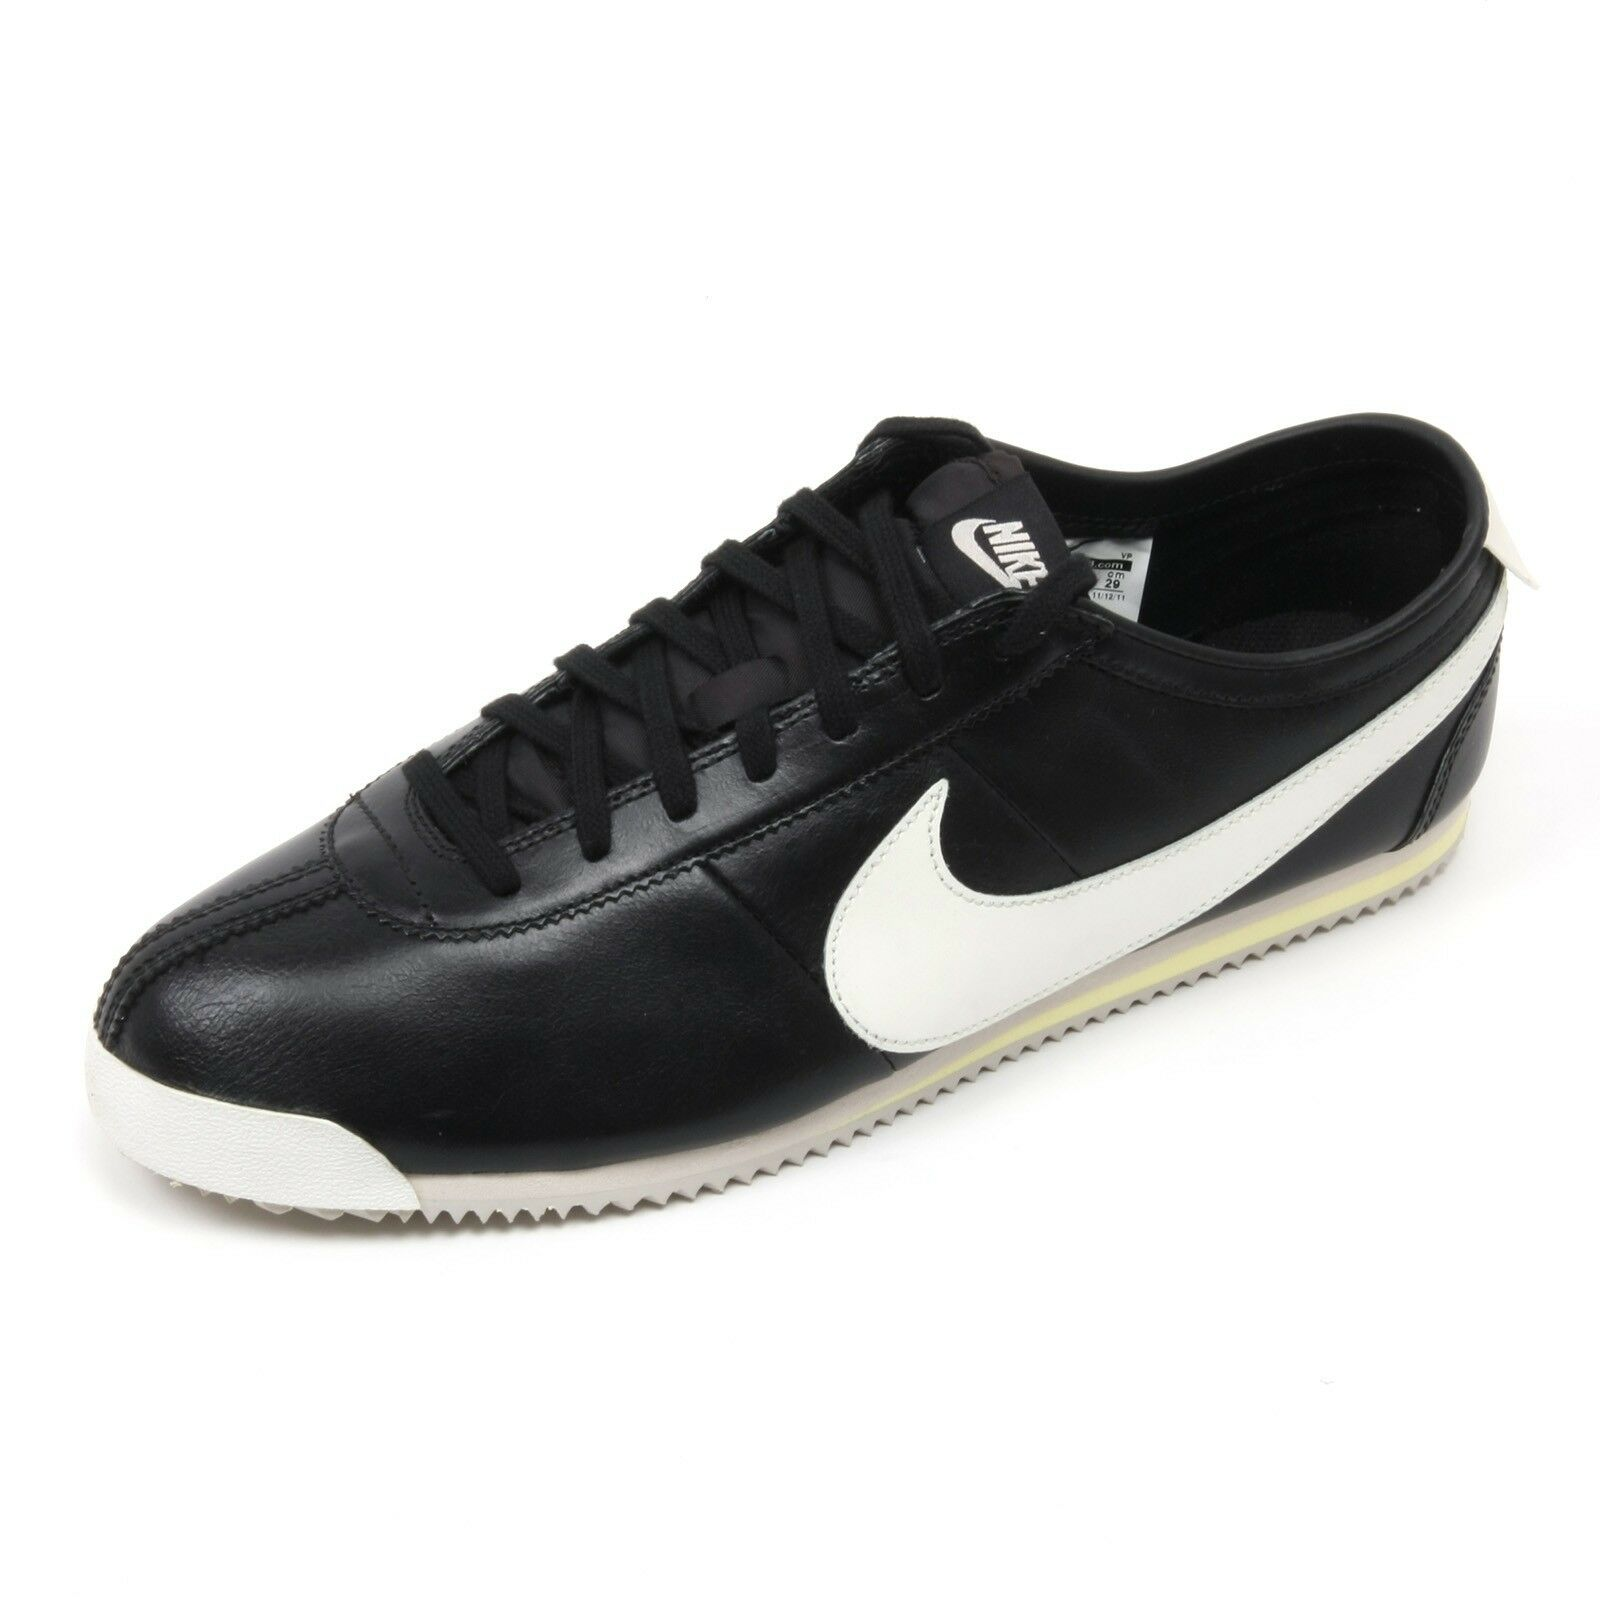 C2654 sneaker uomo NIKE CORTEZ CLASSIC OG LEATHER scarpa avorio/rosso shoe man